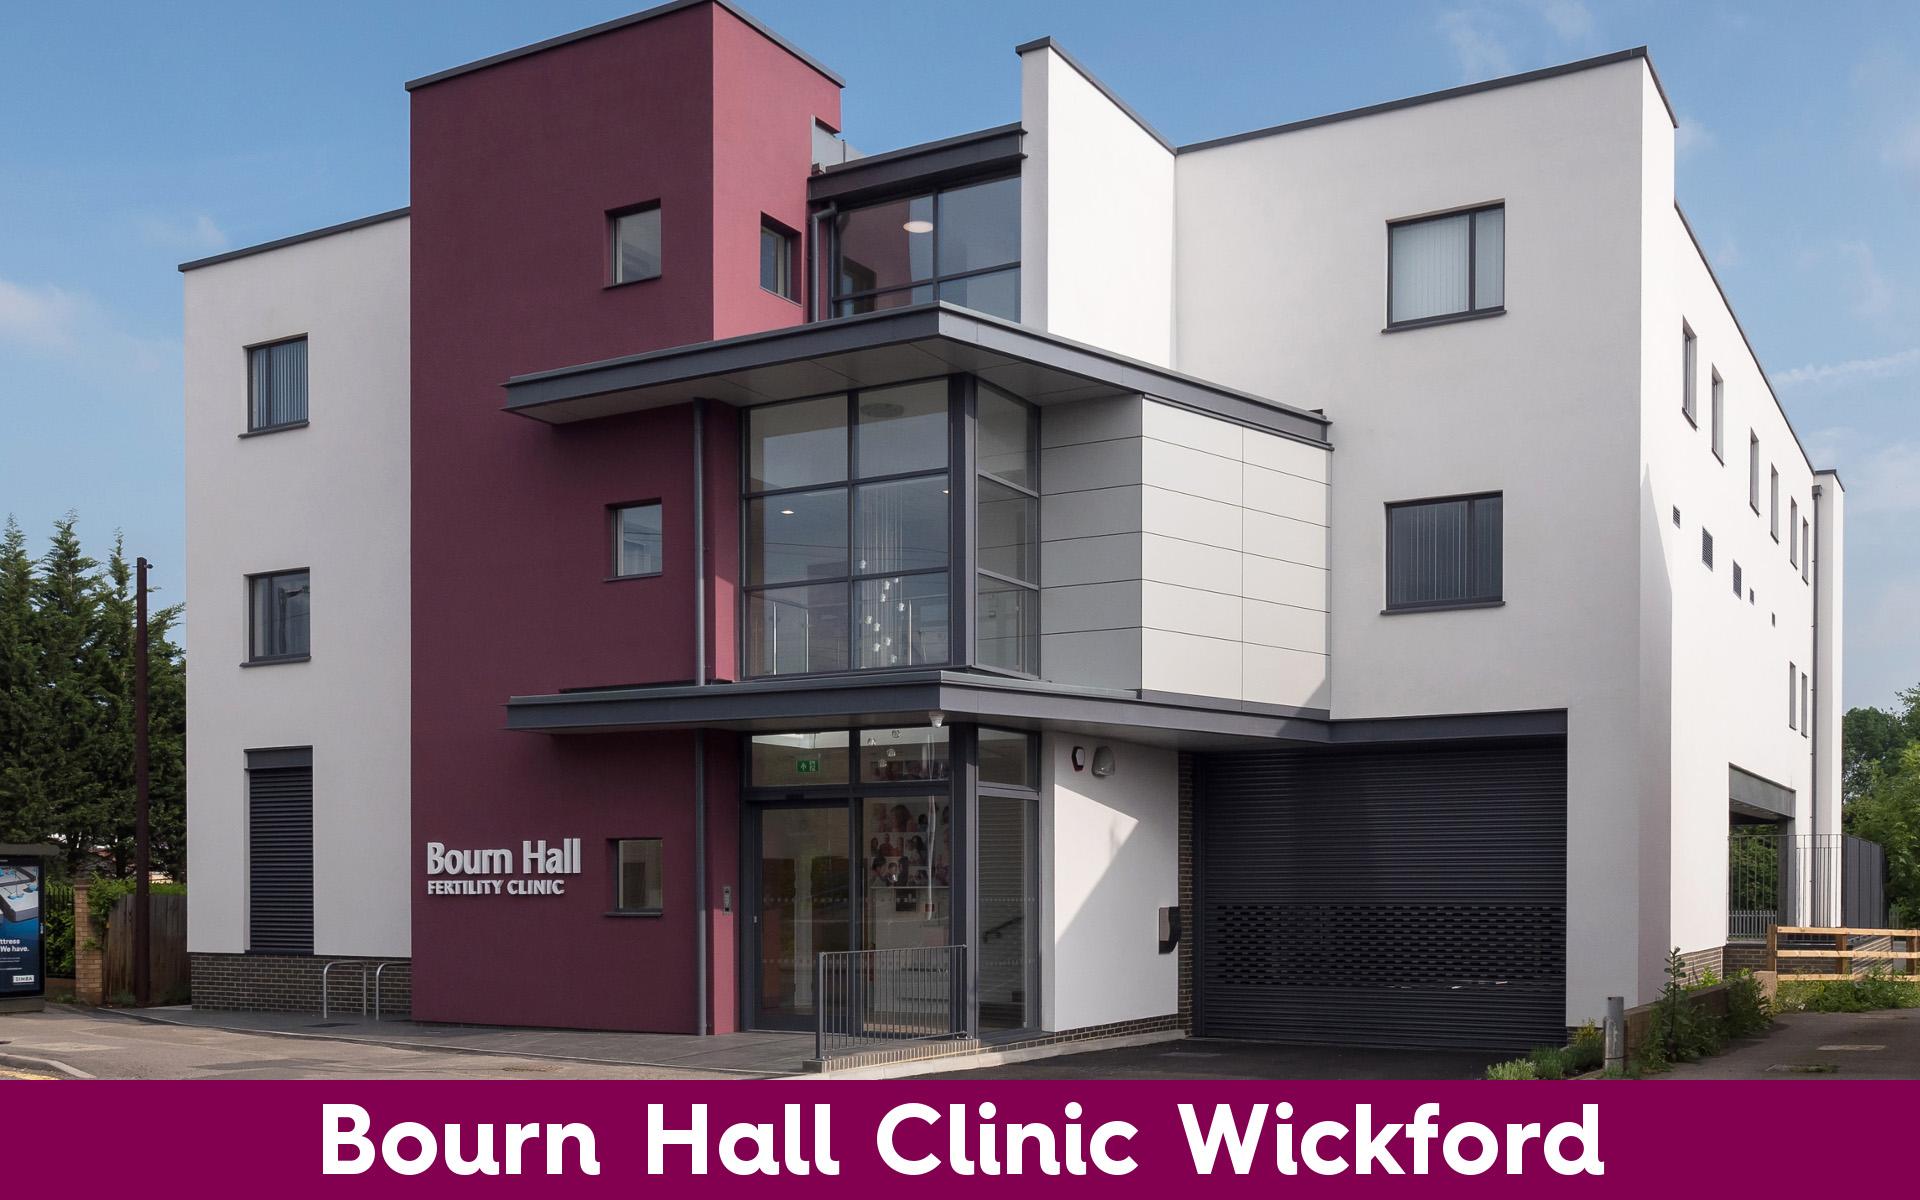 Bourn Hall Wickford